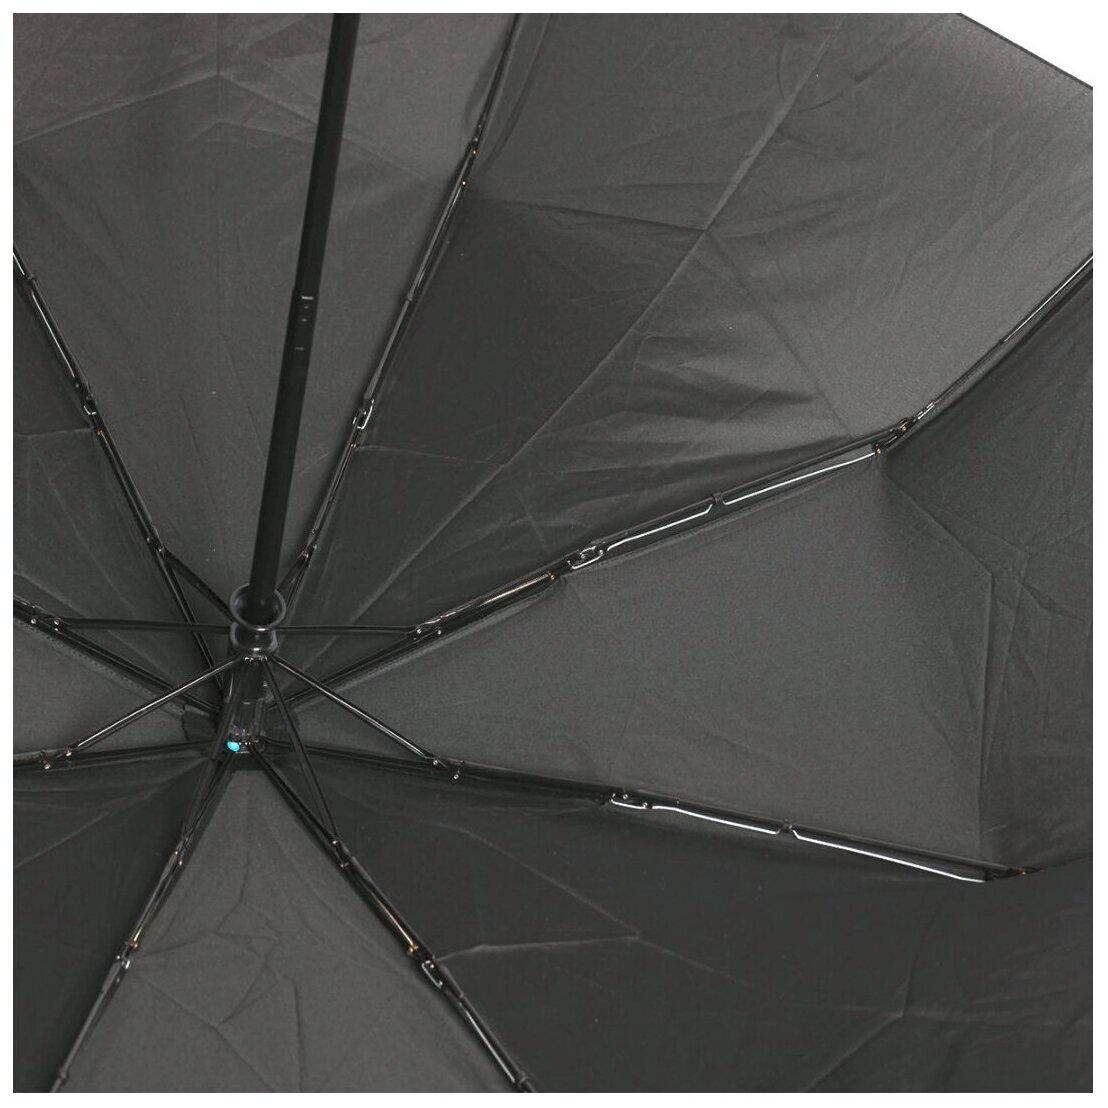 ZEST 13890 - диаметр купола: 108см